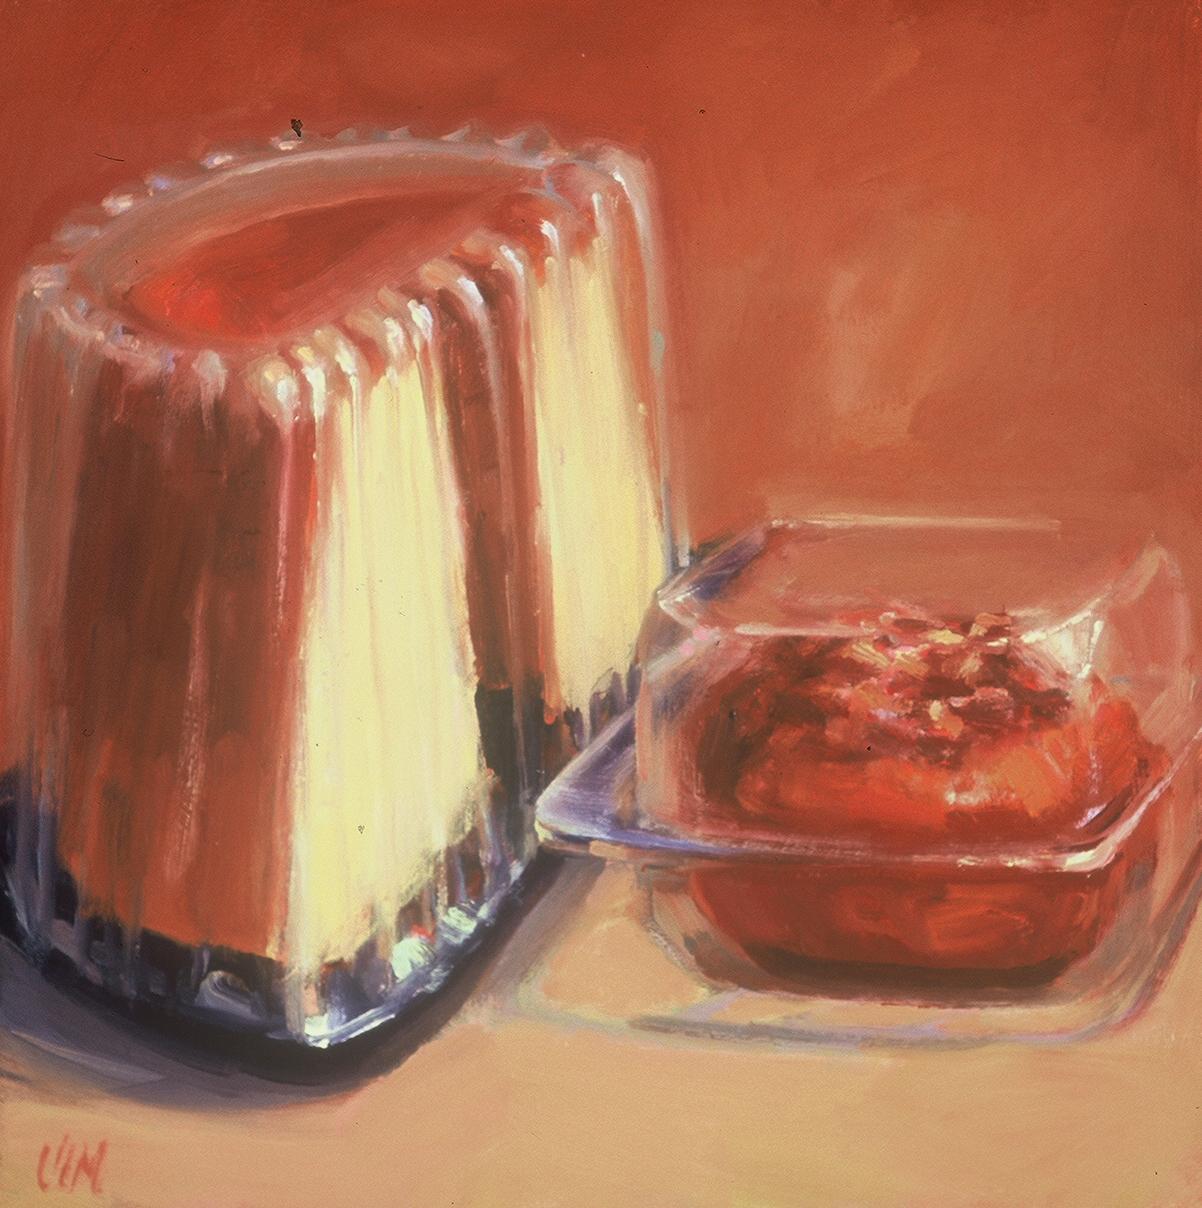 half a bundt cake